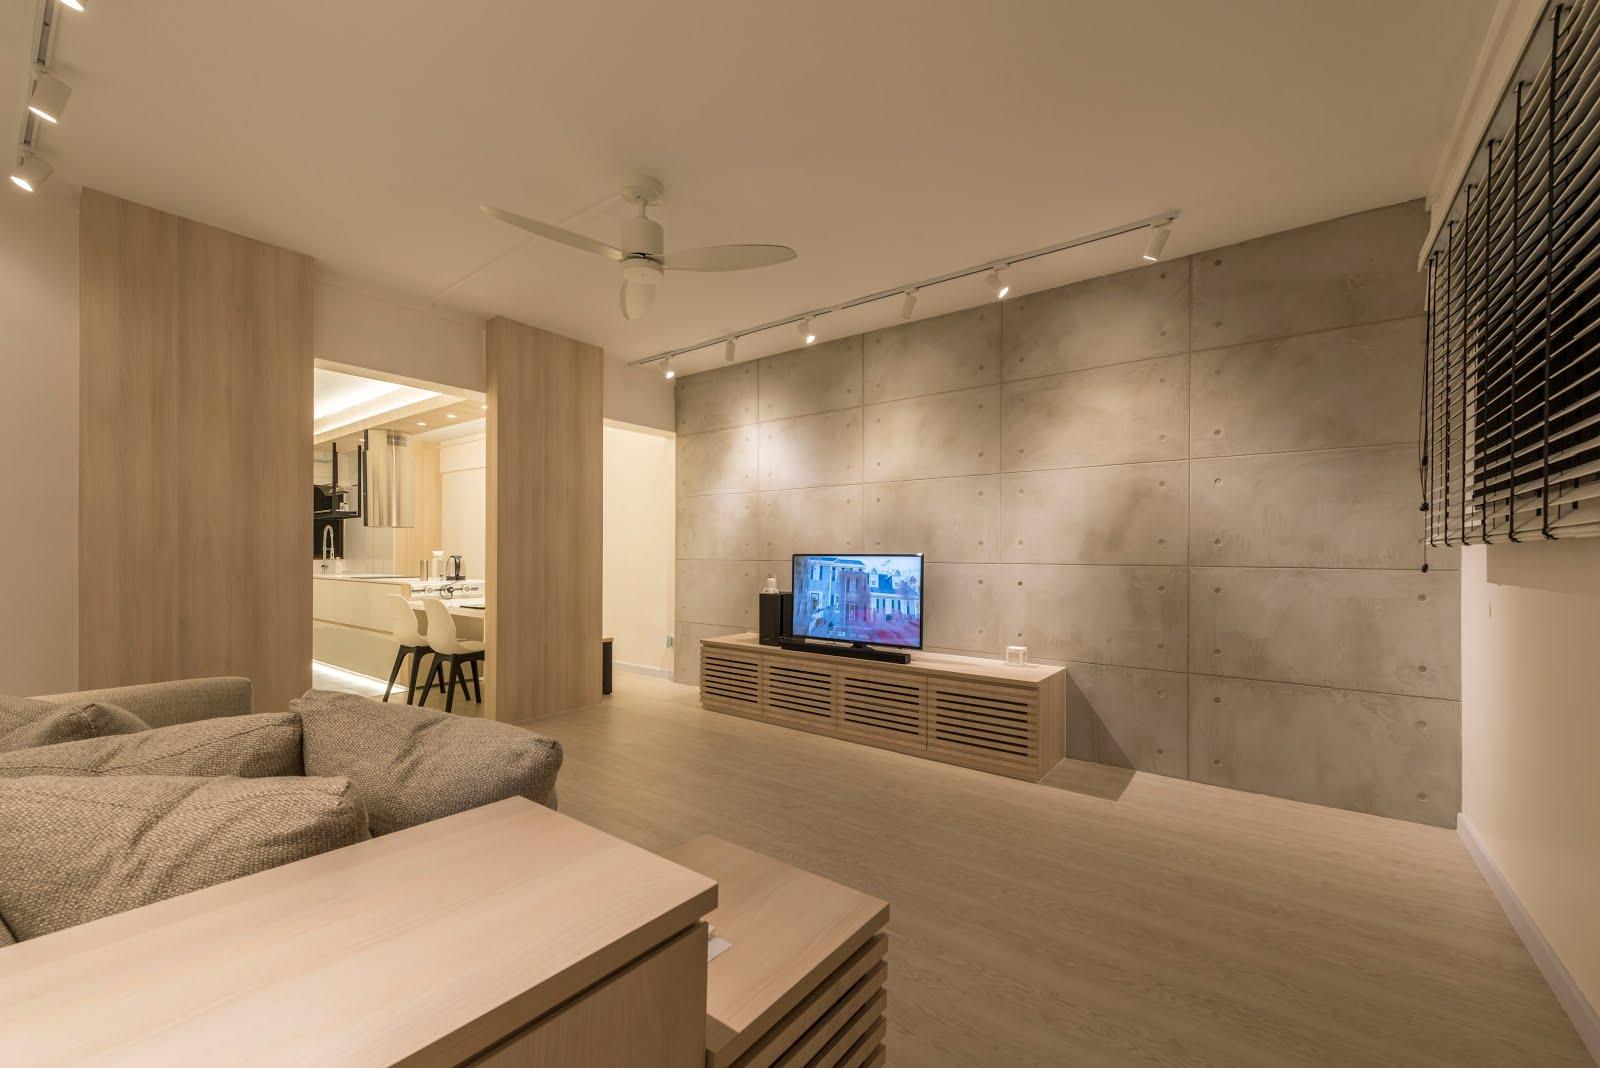 Interior Design Guide: Minimalist interior design , HDB 3 room